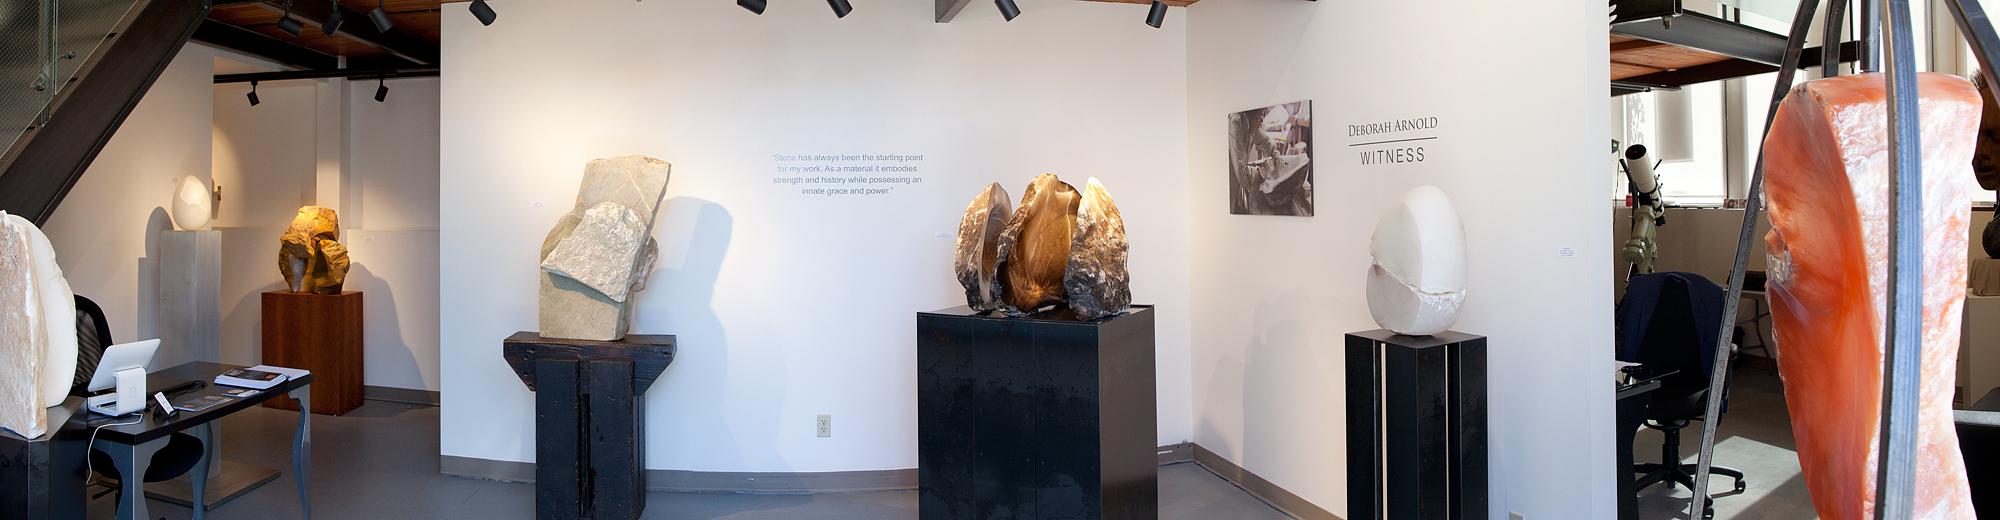 Deborah-Arnold_Witness_Sivarulrasa-Gallery-Installation-View